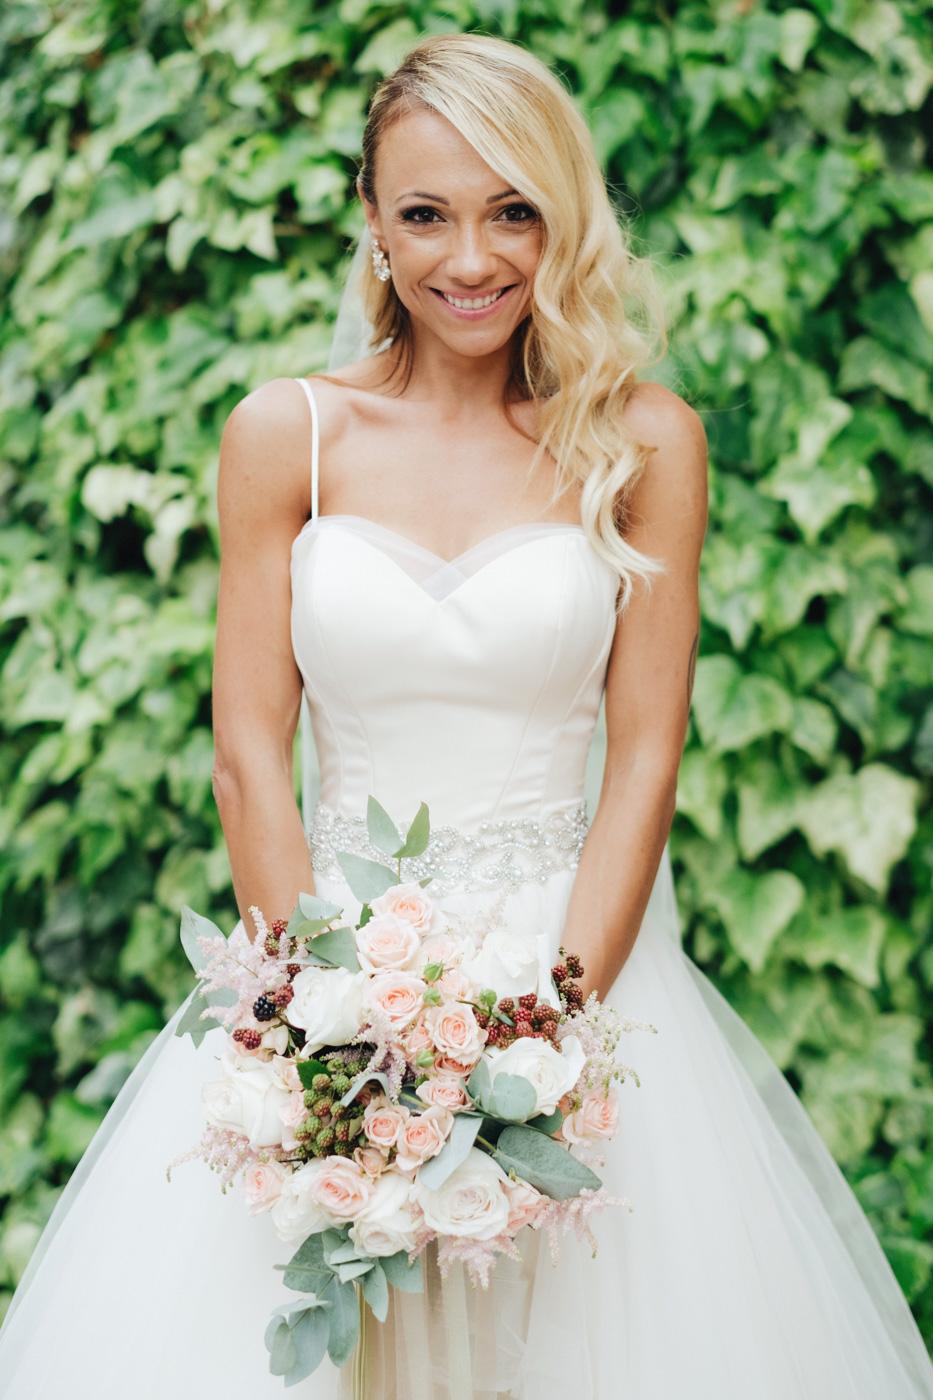 Matrimoni all'italiana wedding photographer italy-105.jpg